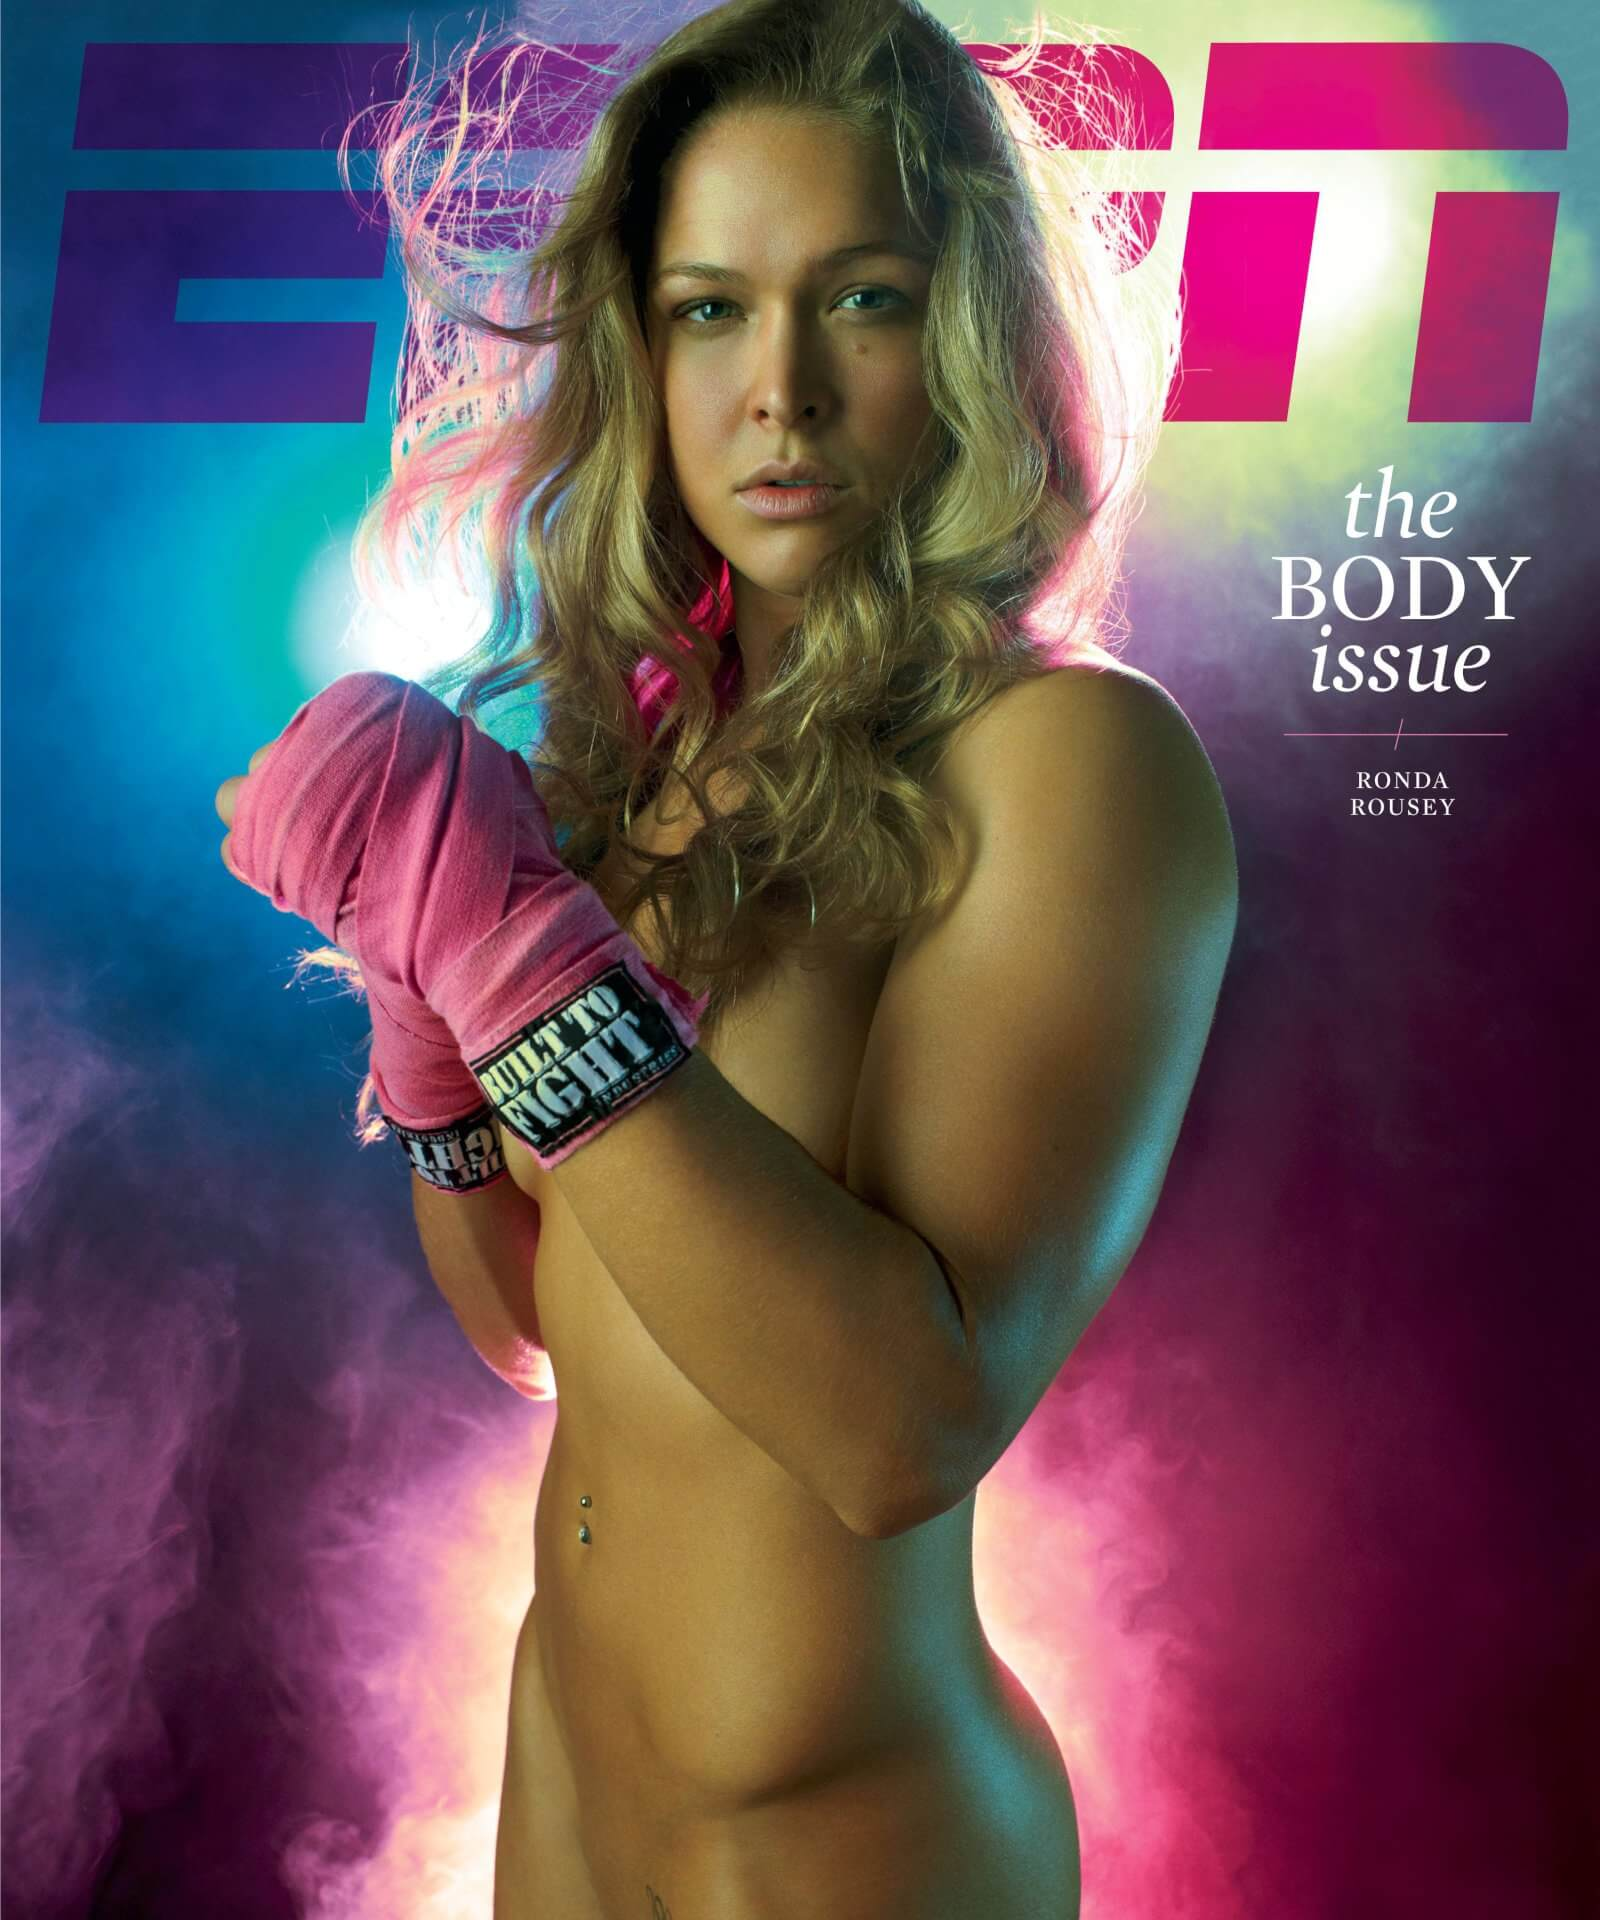 Ronda Rousey make Pose magazine